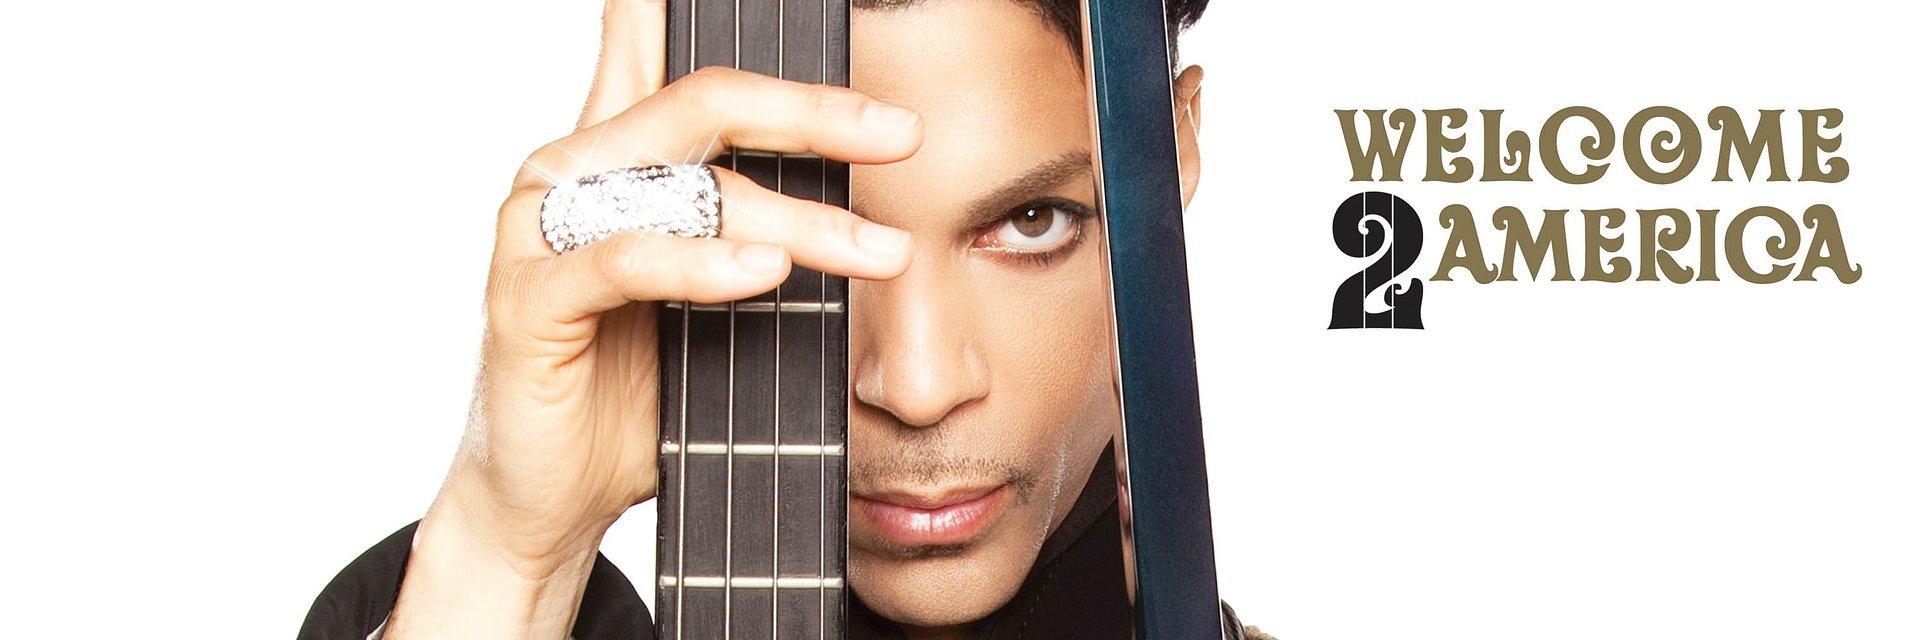 "Nowy album Prince'a ""Welcome 2 America""już 30 lipca!"